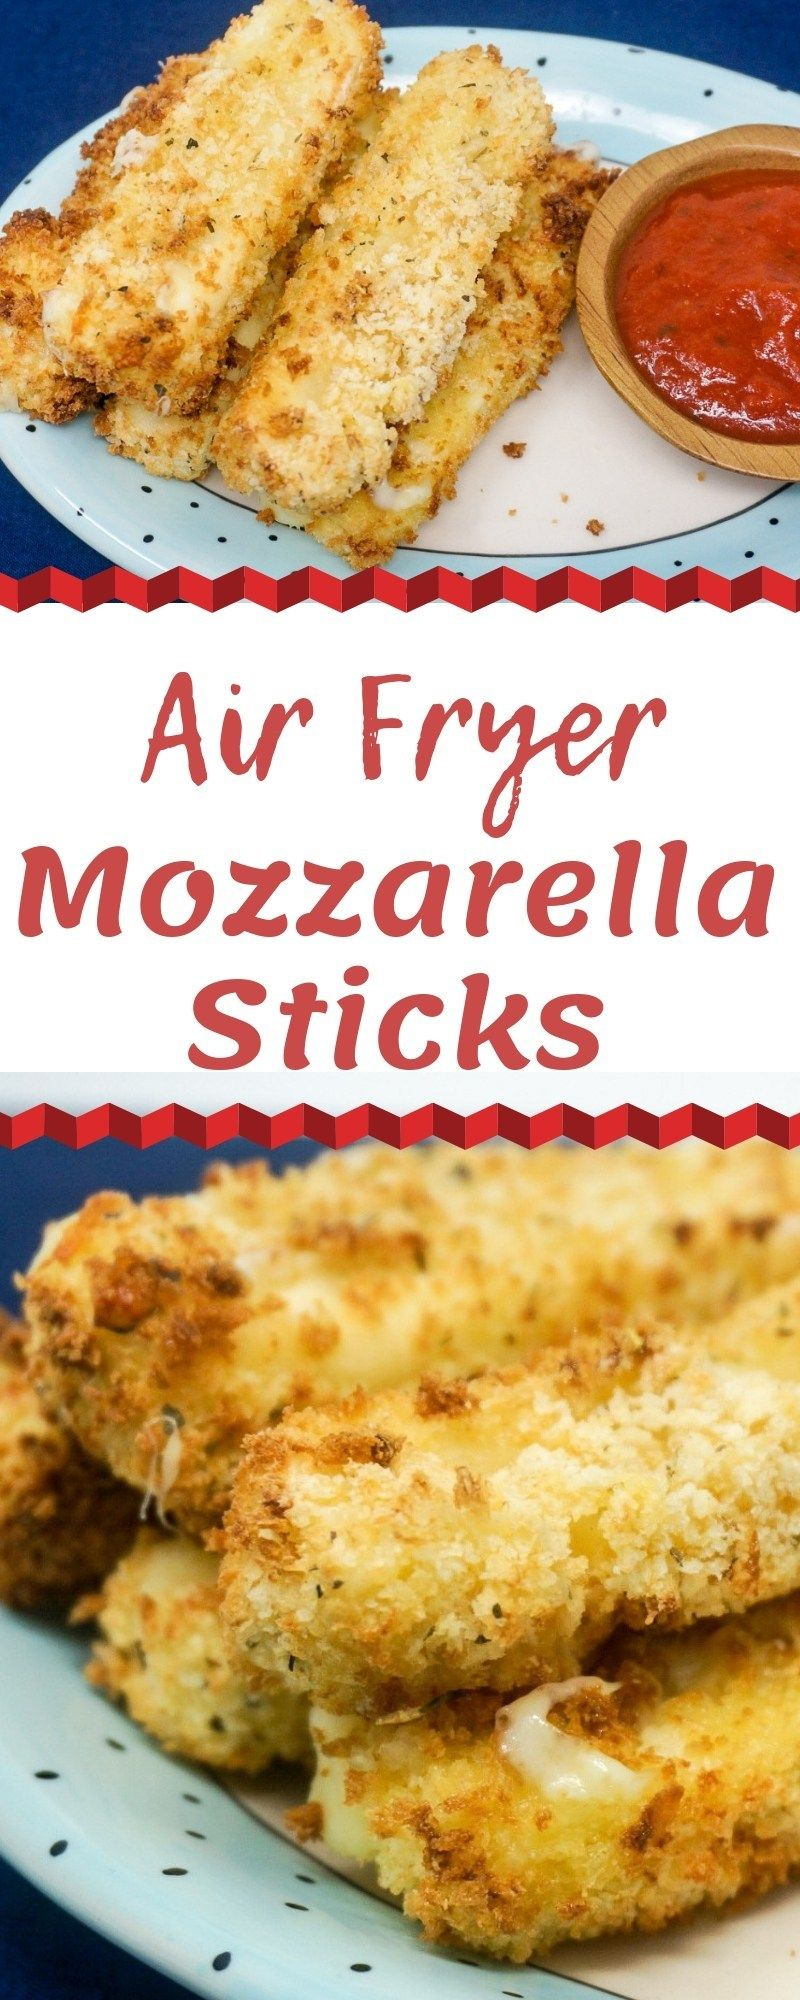 Air Fryer Mozzarella Sticks Recipe Air fryer recipes